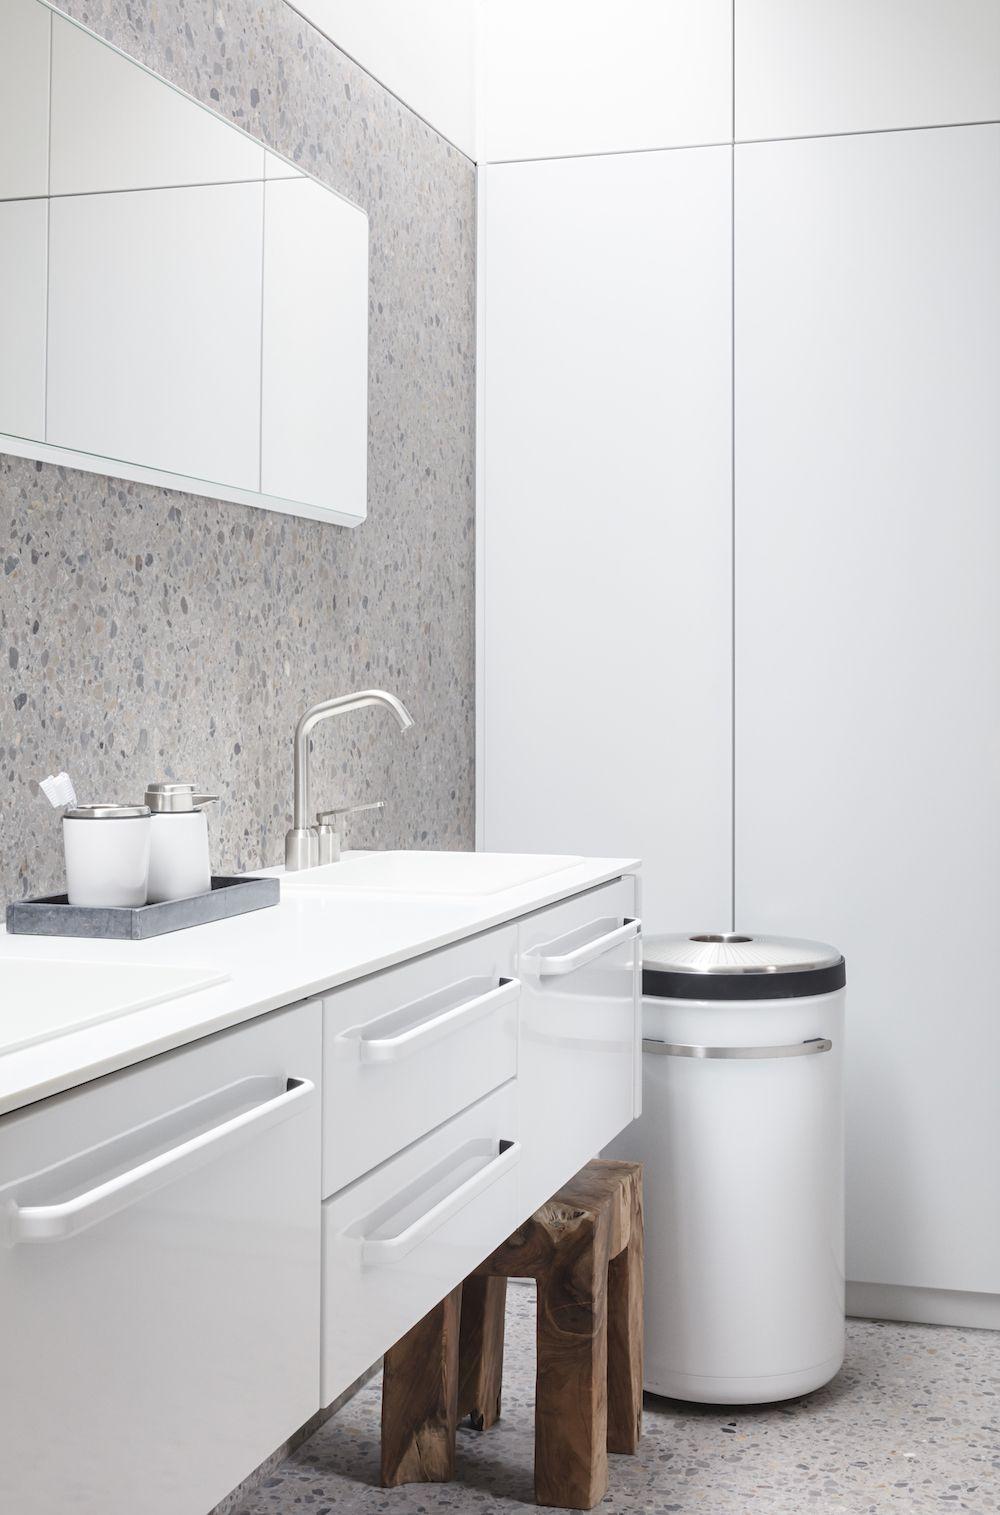 Vipp Opens New Hotel Room In Landmark Chimney House In Copenhagen In 2020 House Bathroom Tall Cabinet Large Open Plan Kitchens